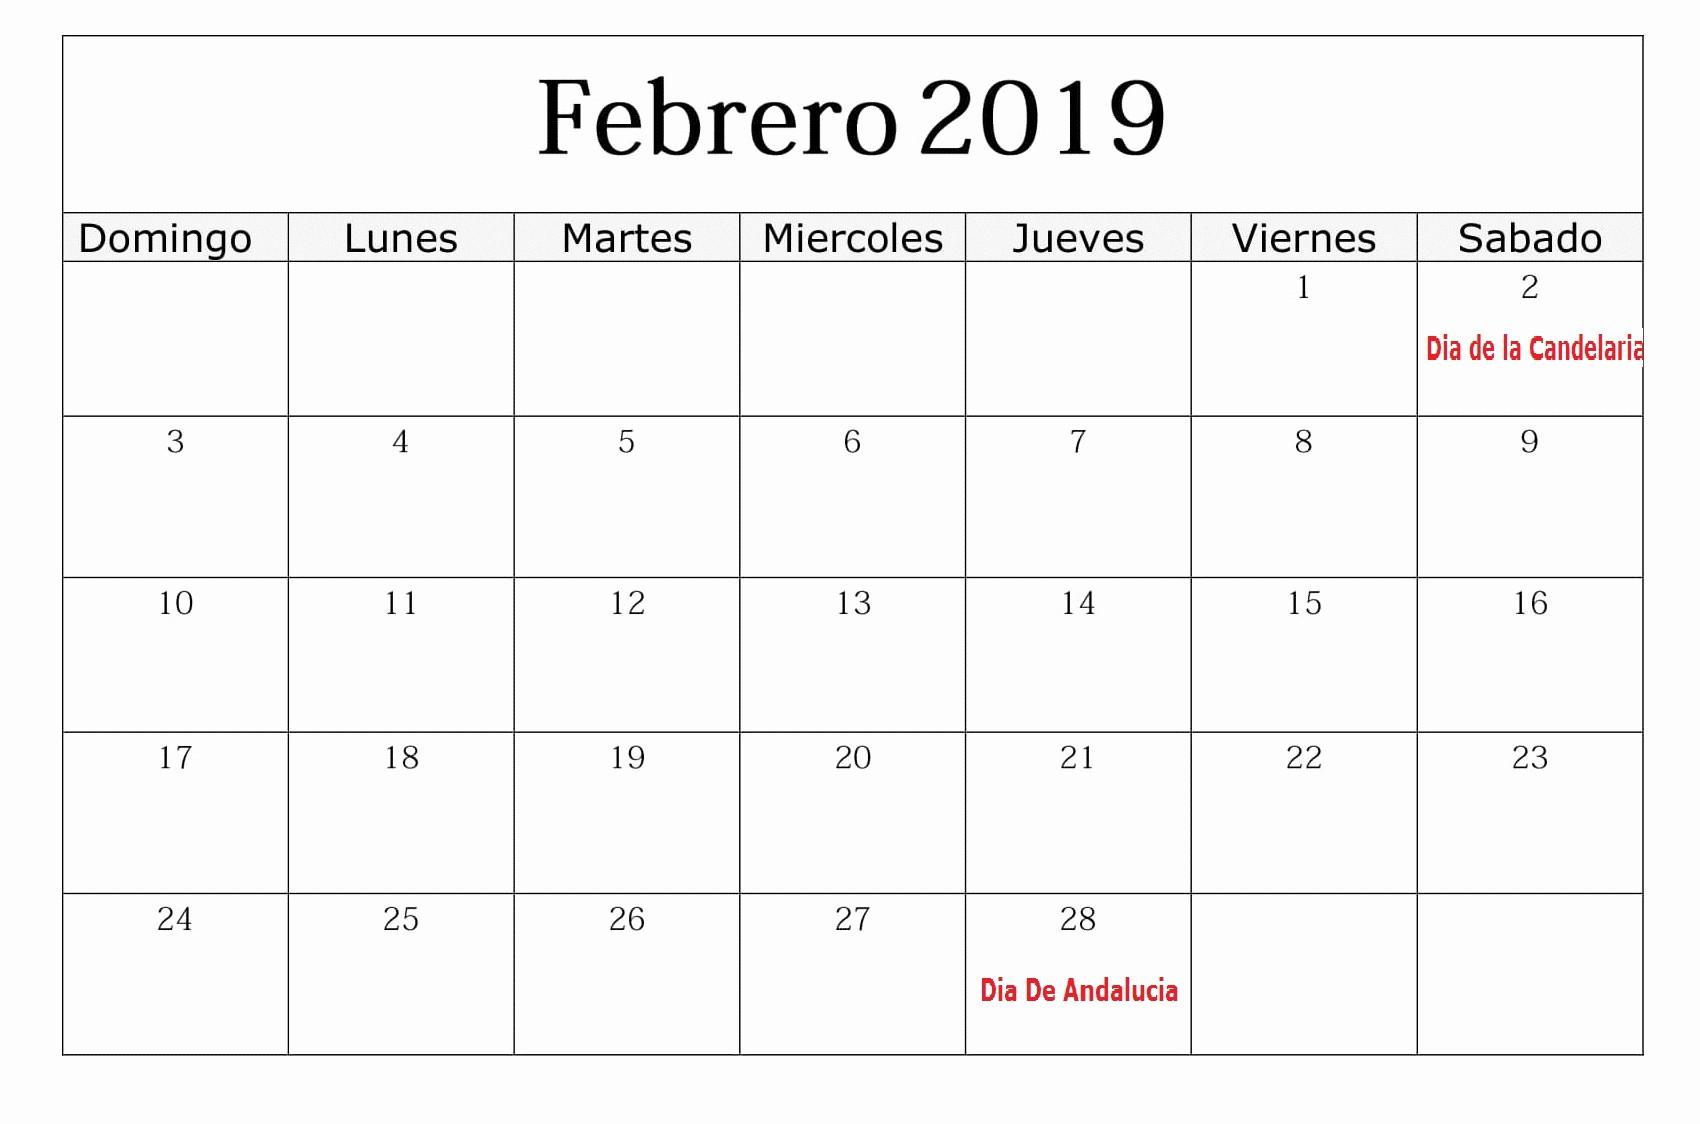 Calendario Febrero 2018 Para Imprimir Awesome Calendario Febrero 2019 Con Festivos Grande – Best Reviews